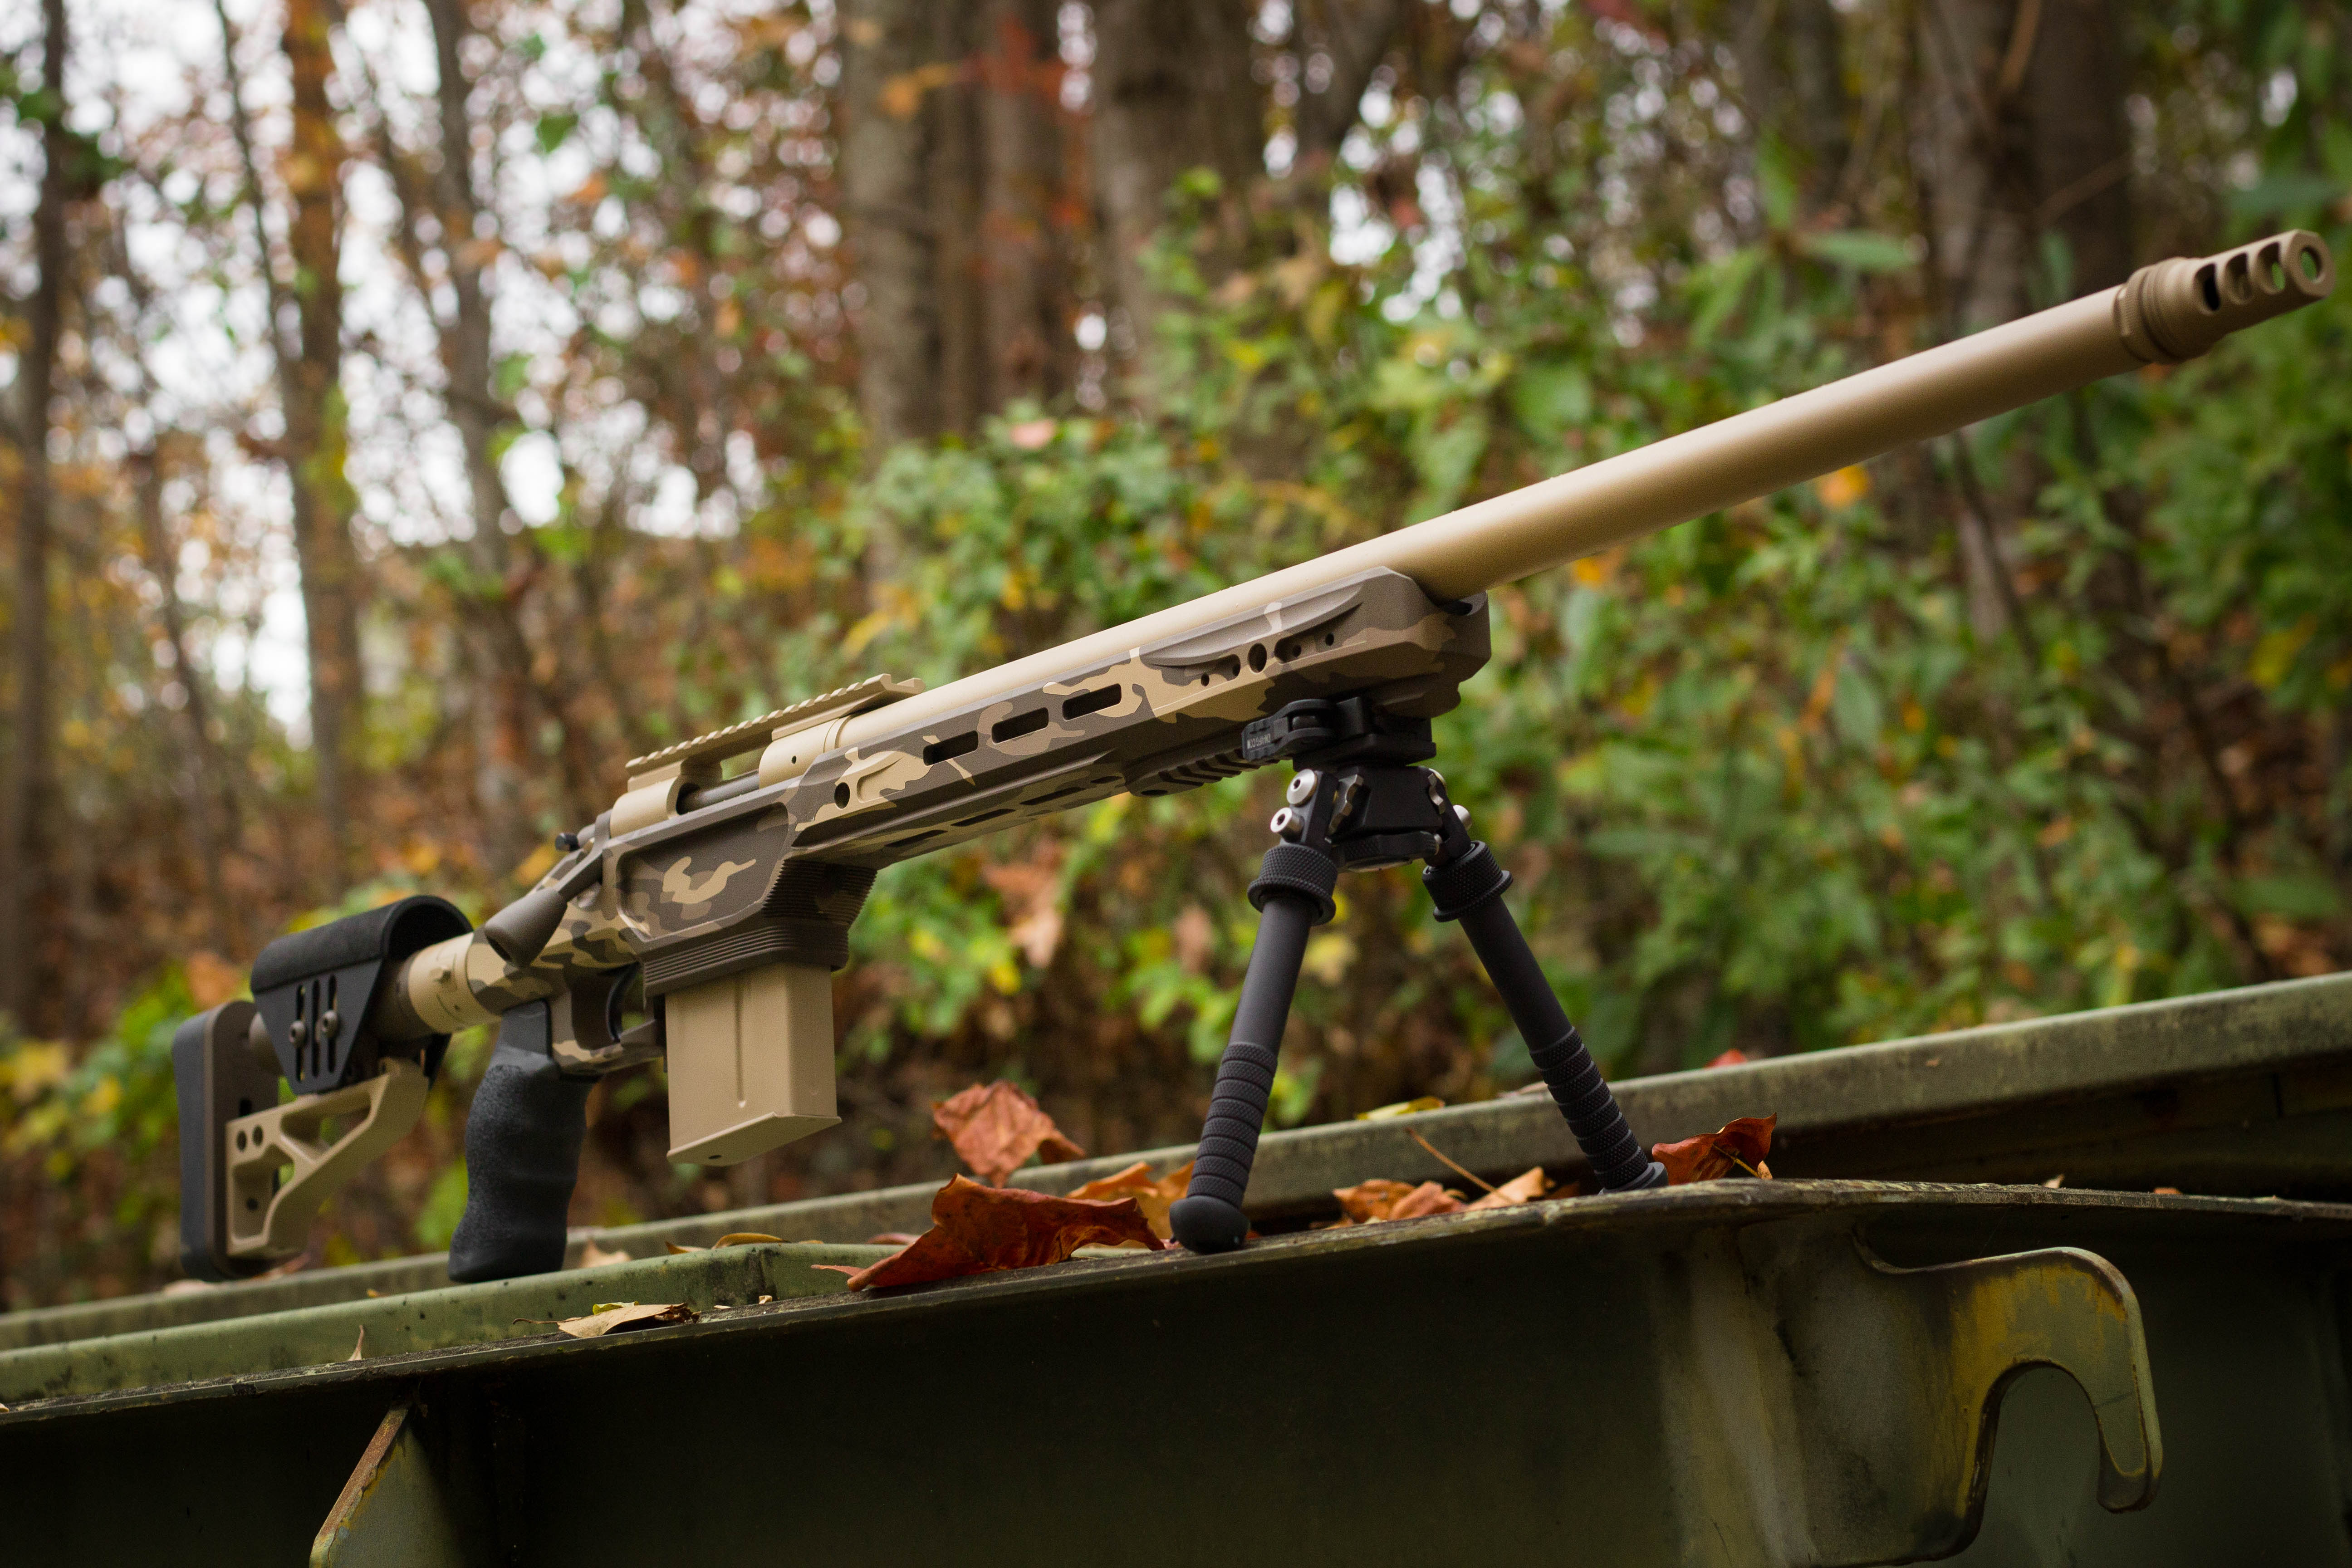 Camouflage Cerakote Rifle